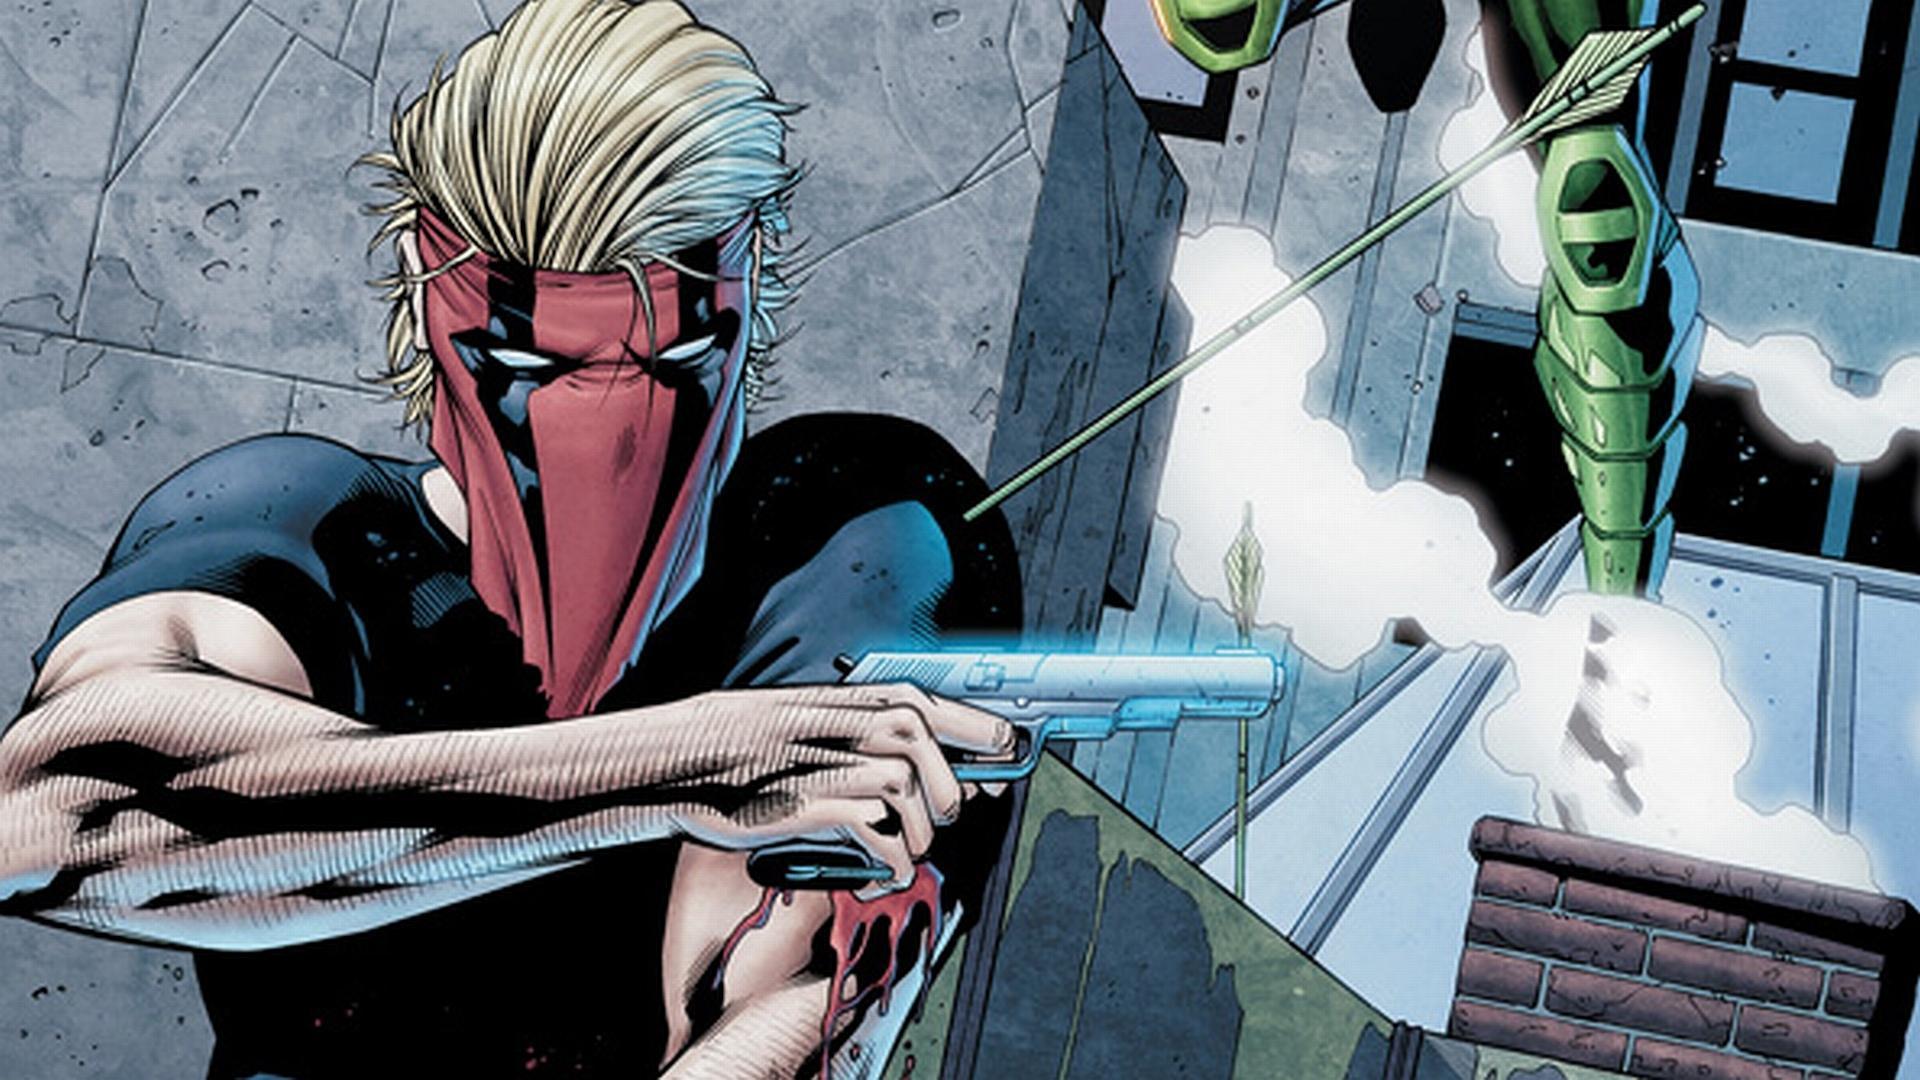 Grifter Comics wallpapers HD quality